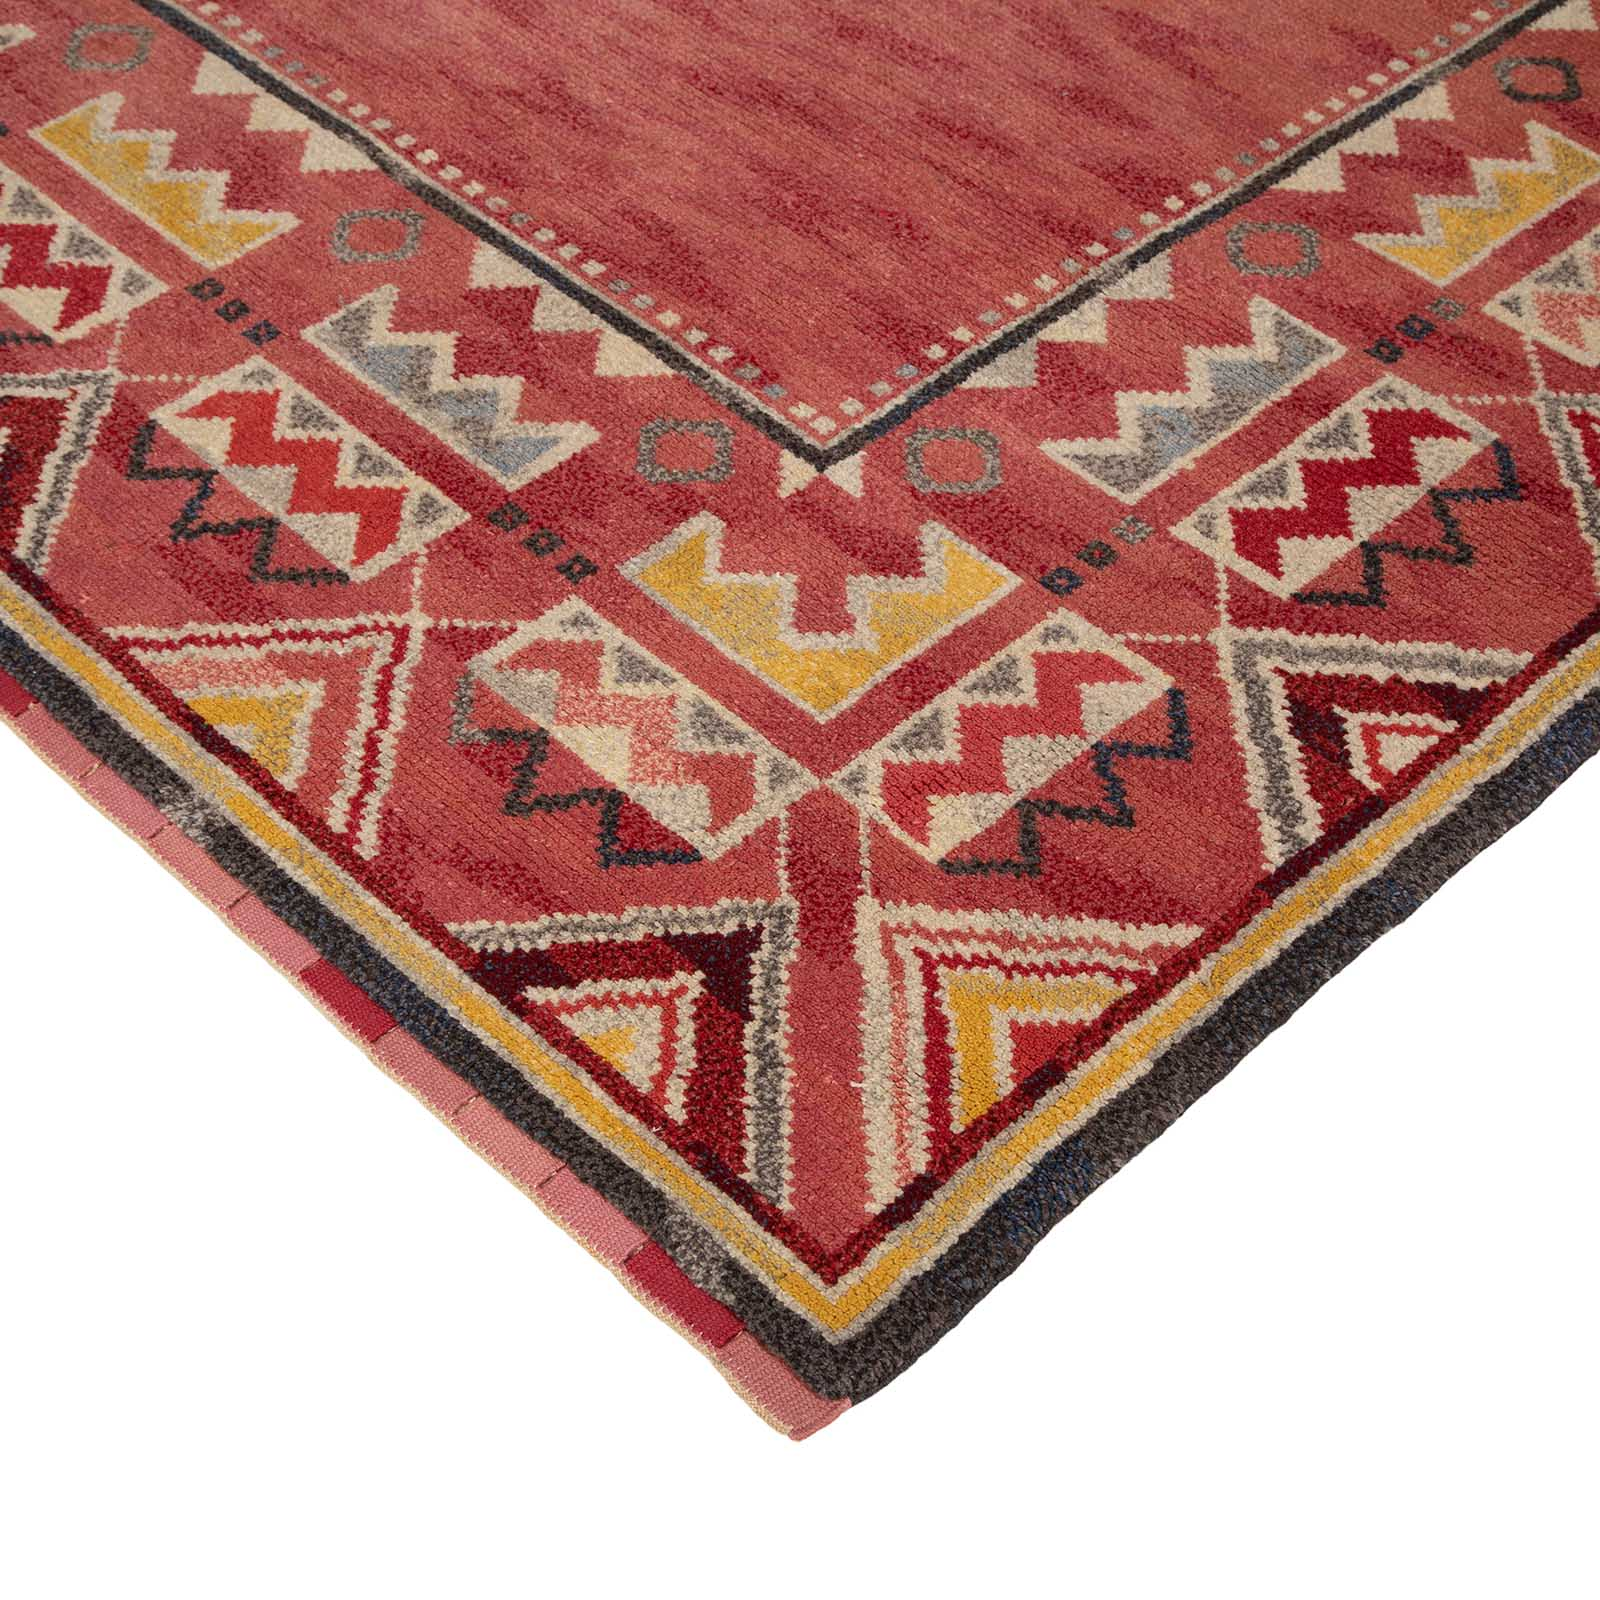 A large Swedish mid century rug